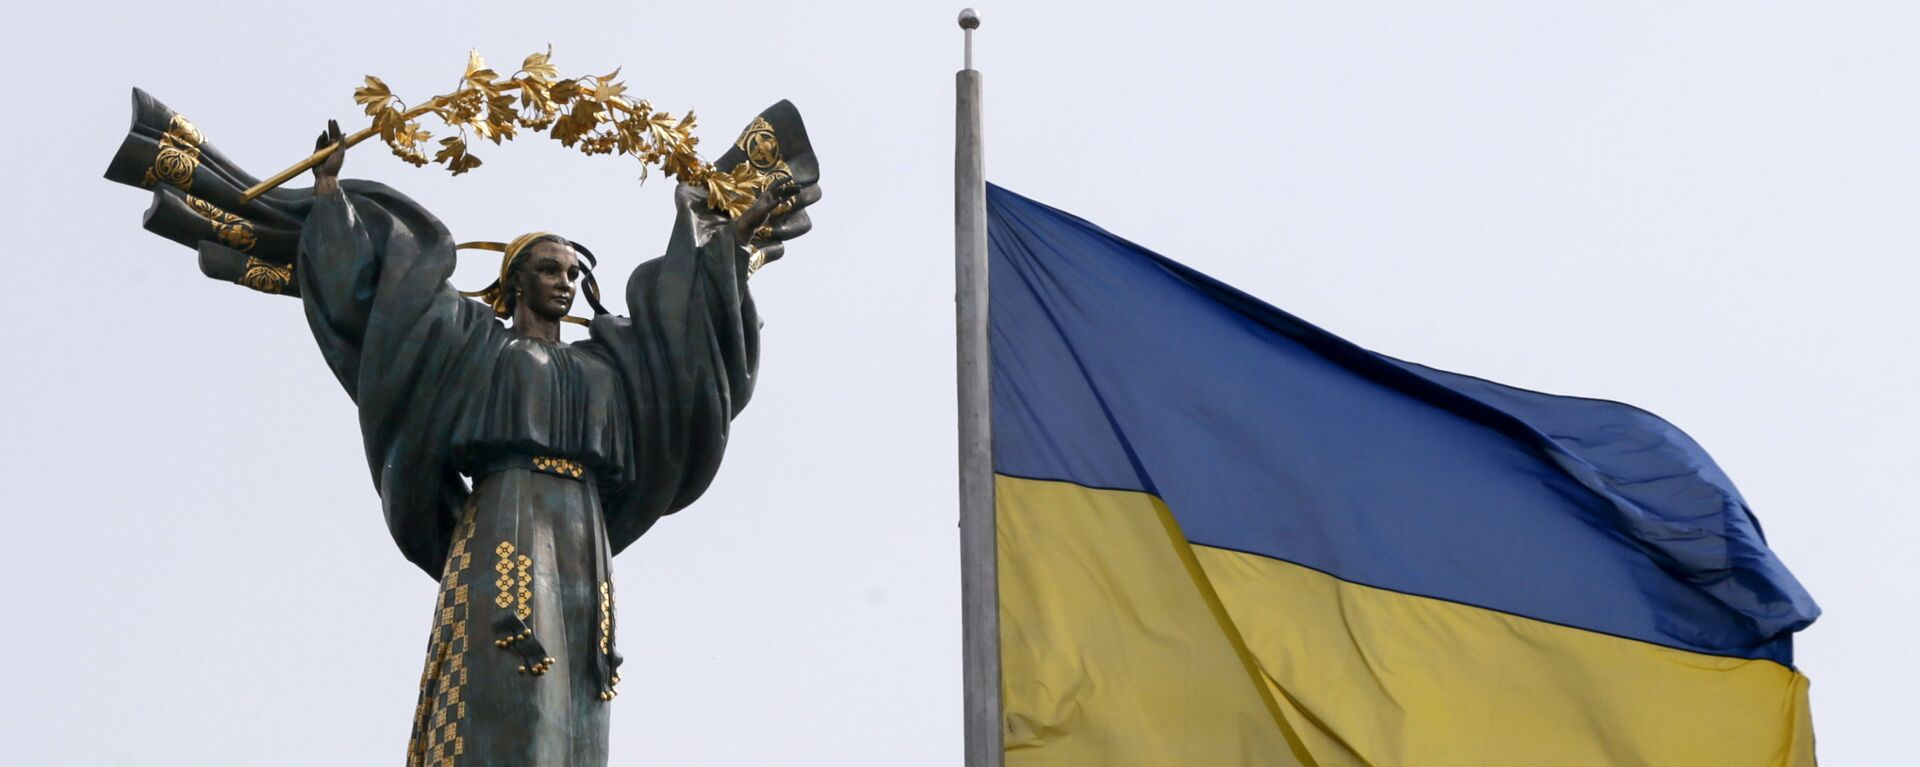 Флаг Украины на фоне Монумента Независимости на площади Независимости в Киеве - Sputnik Таджикистан, 1920, 13.09.2021